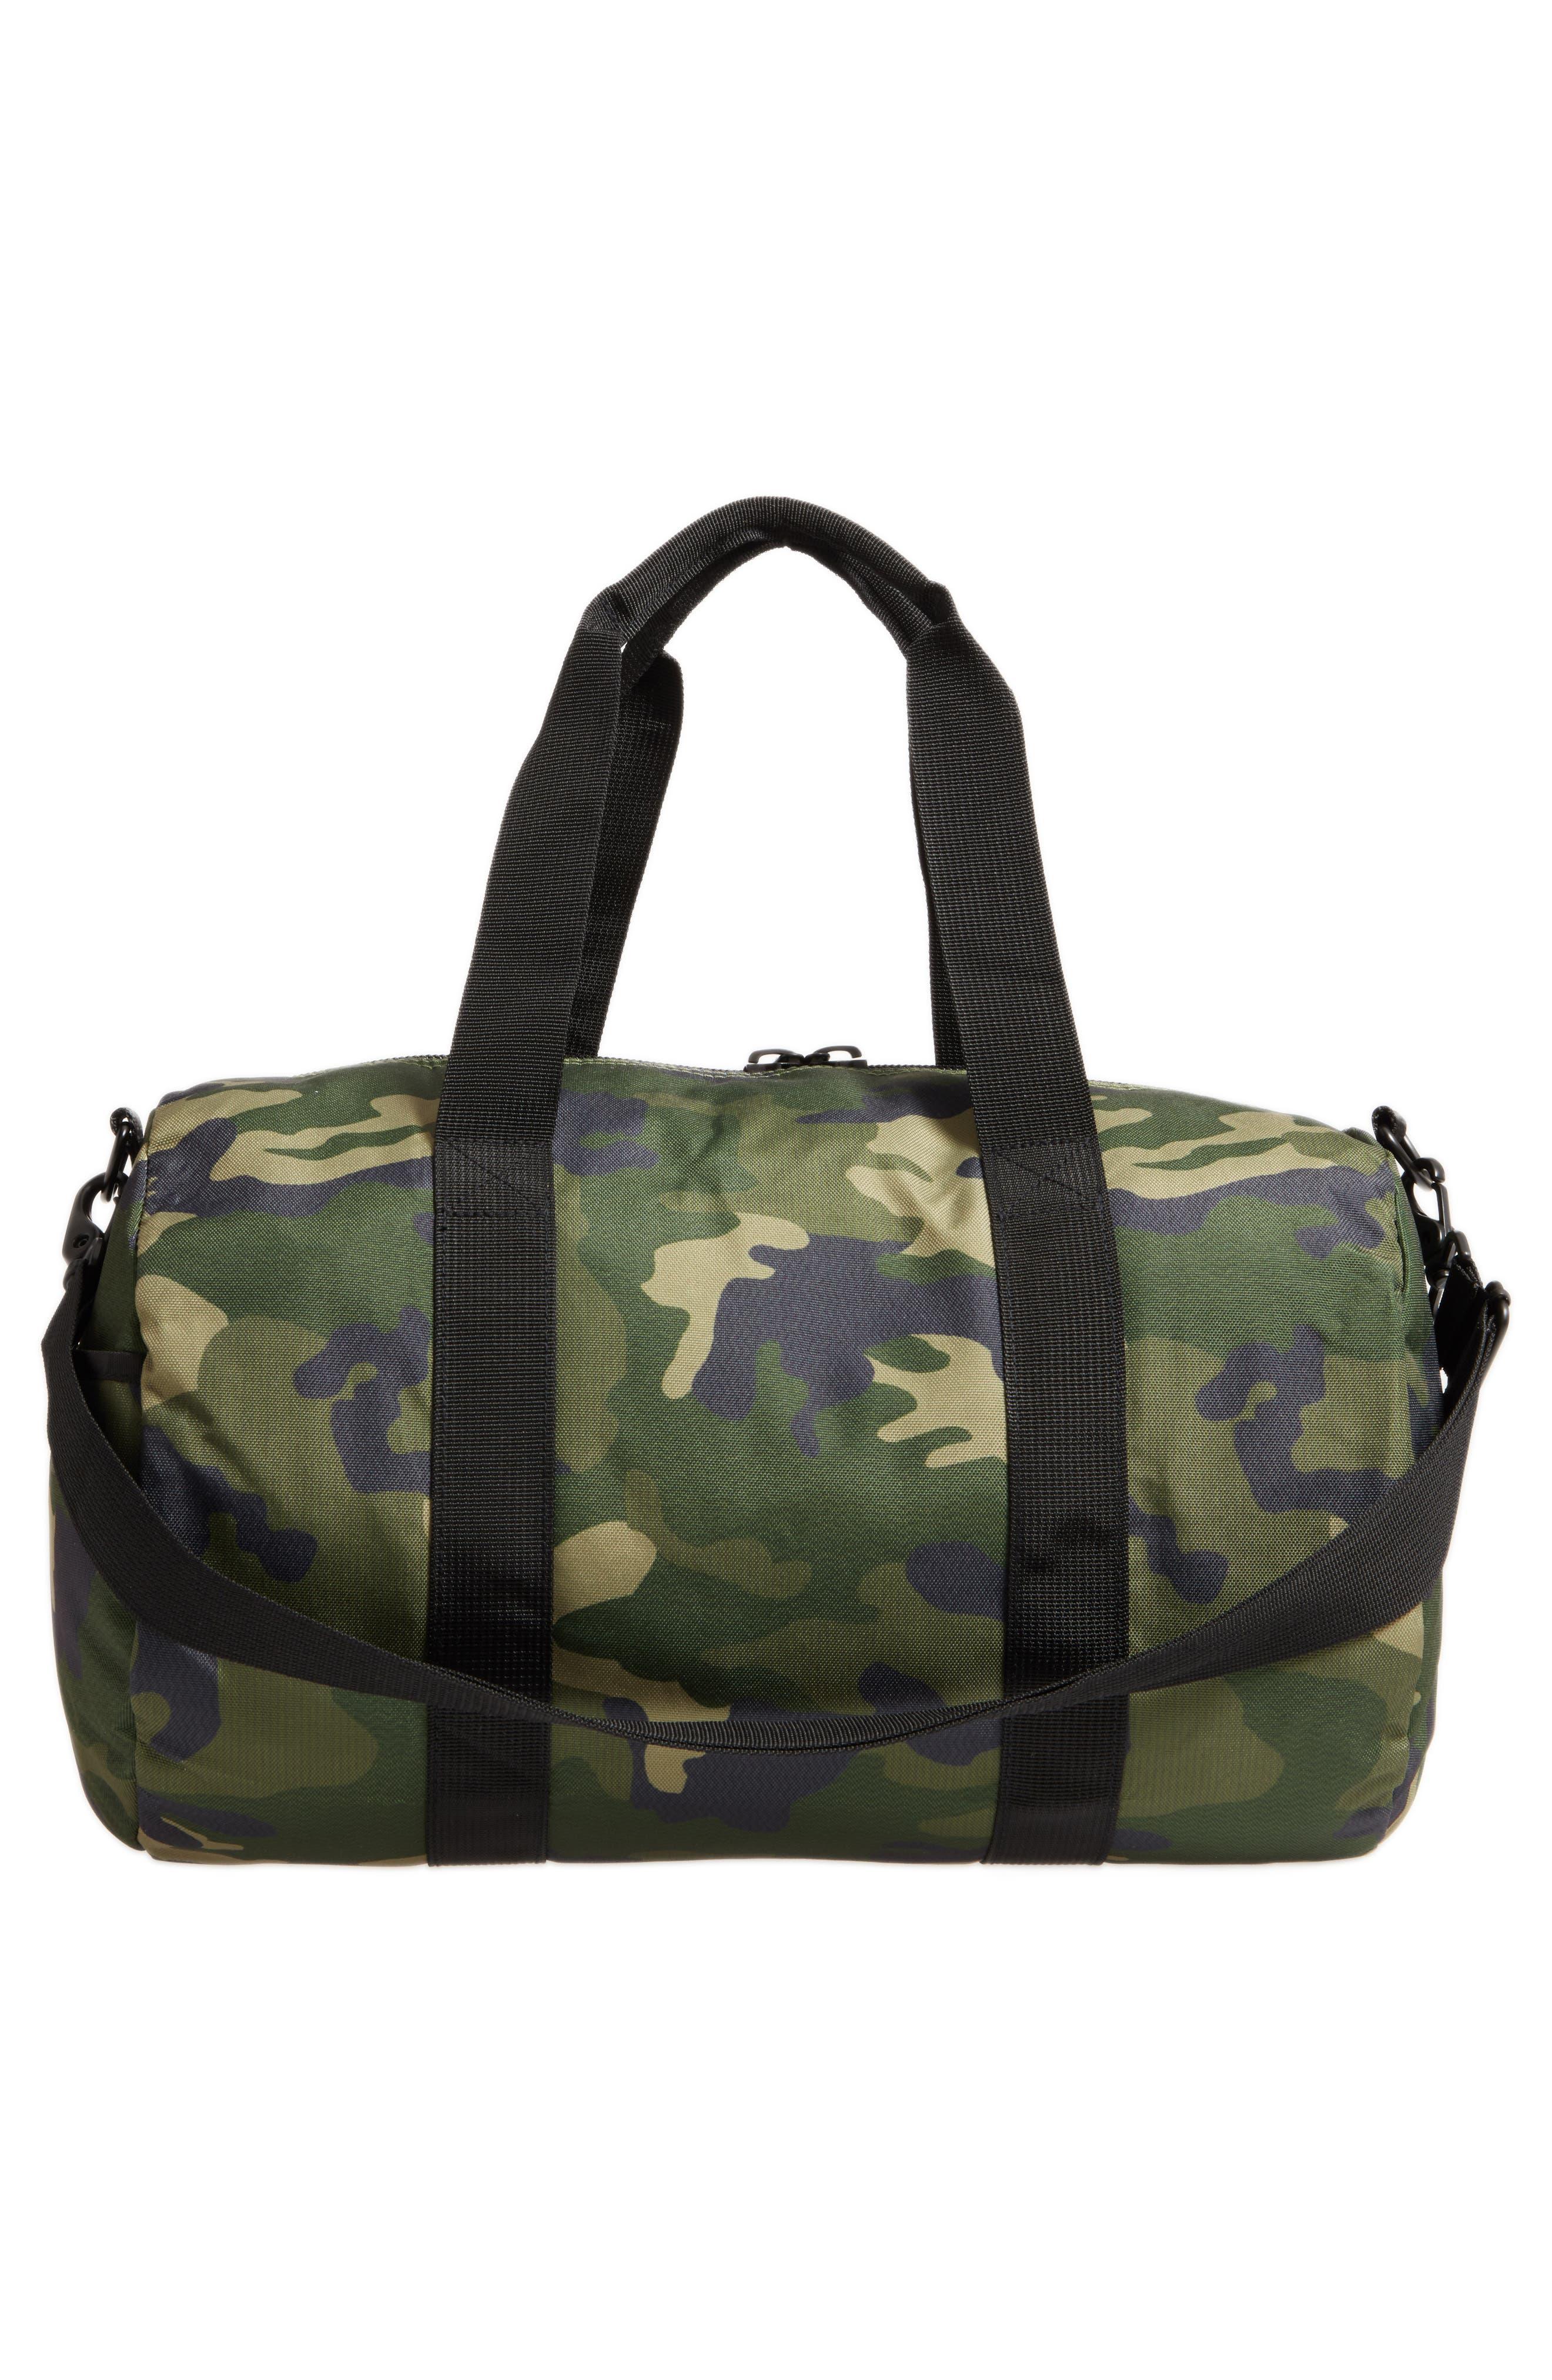 Roadie Small Duffel Bag,                             Alternate thumbnail 3, color,                             GREEN CAMO